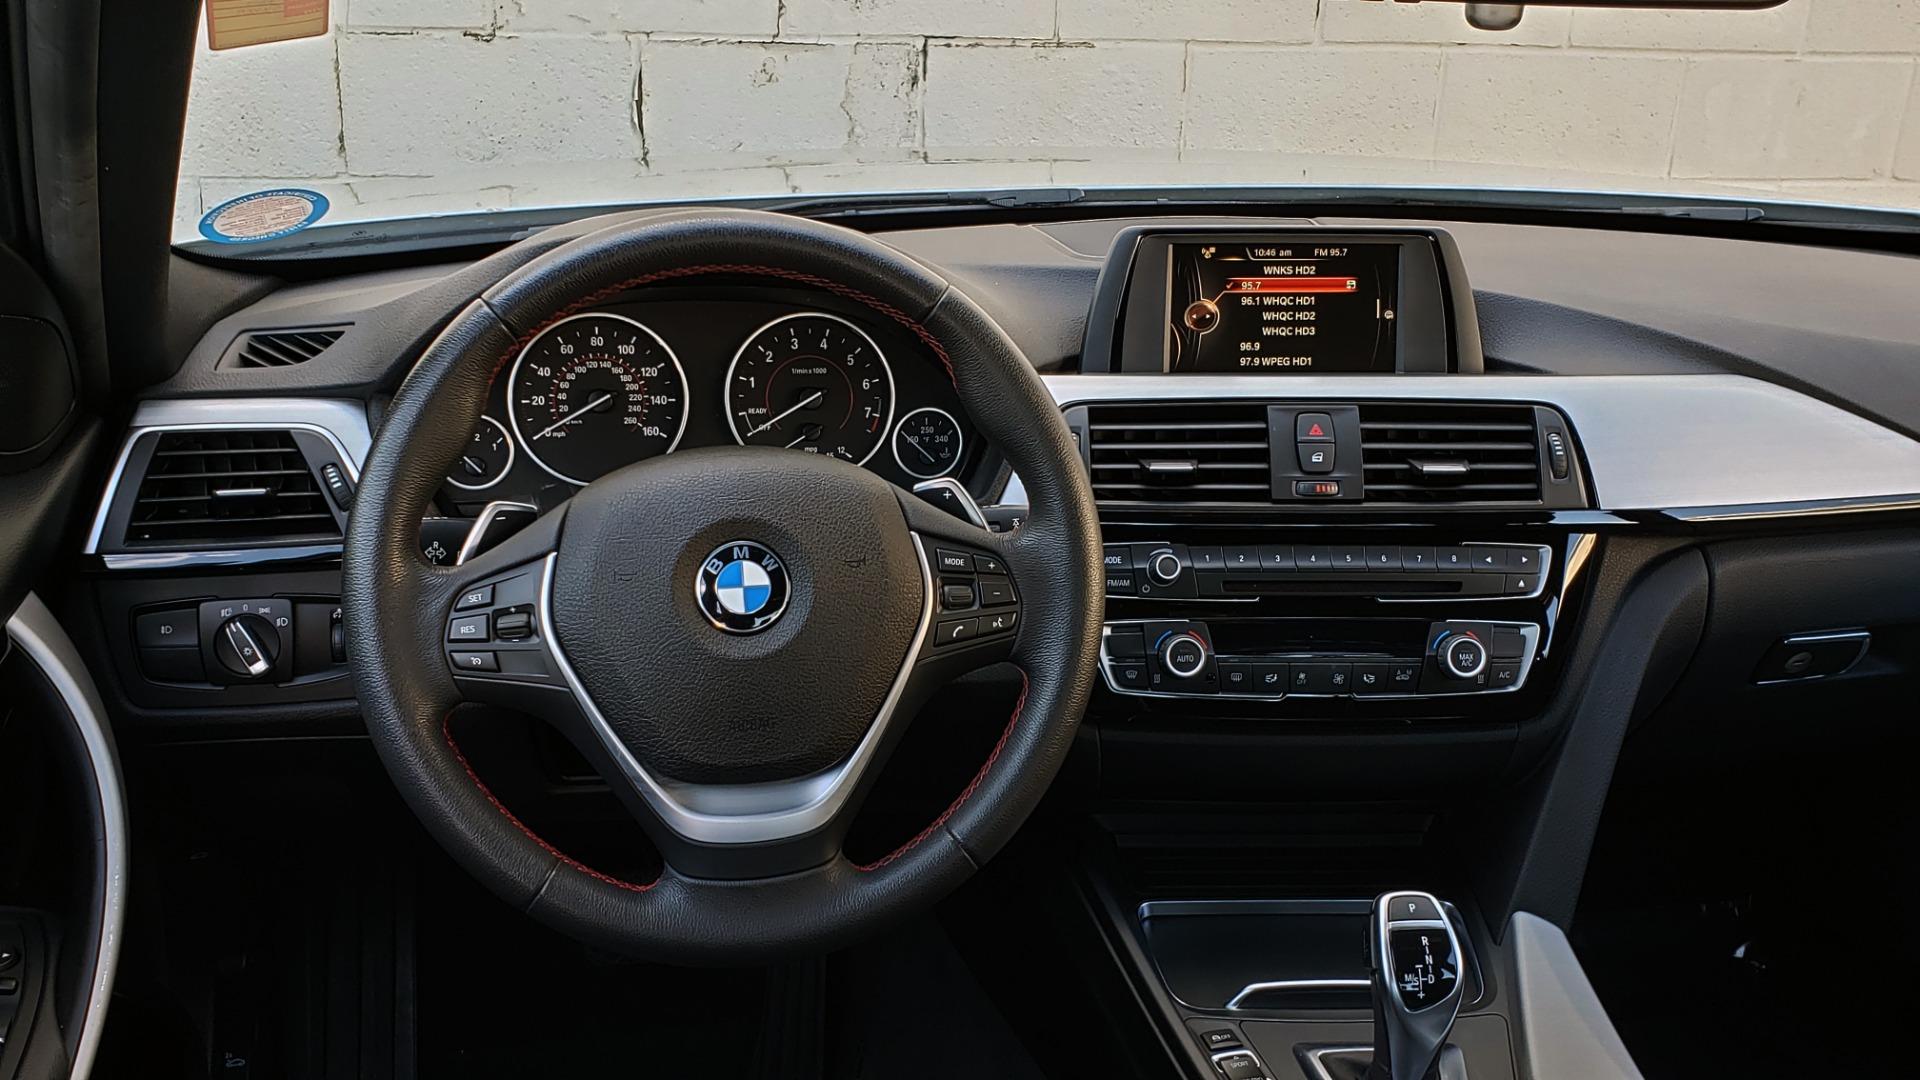 Used 2017 BMW 3 SERIES 330I SPORT SEDAN / DRVR ASST PKG / SUNROOF / REARVIEW for sale Sold at Formula Imports in Charlotte NC 28227 37